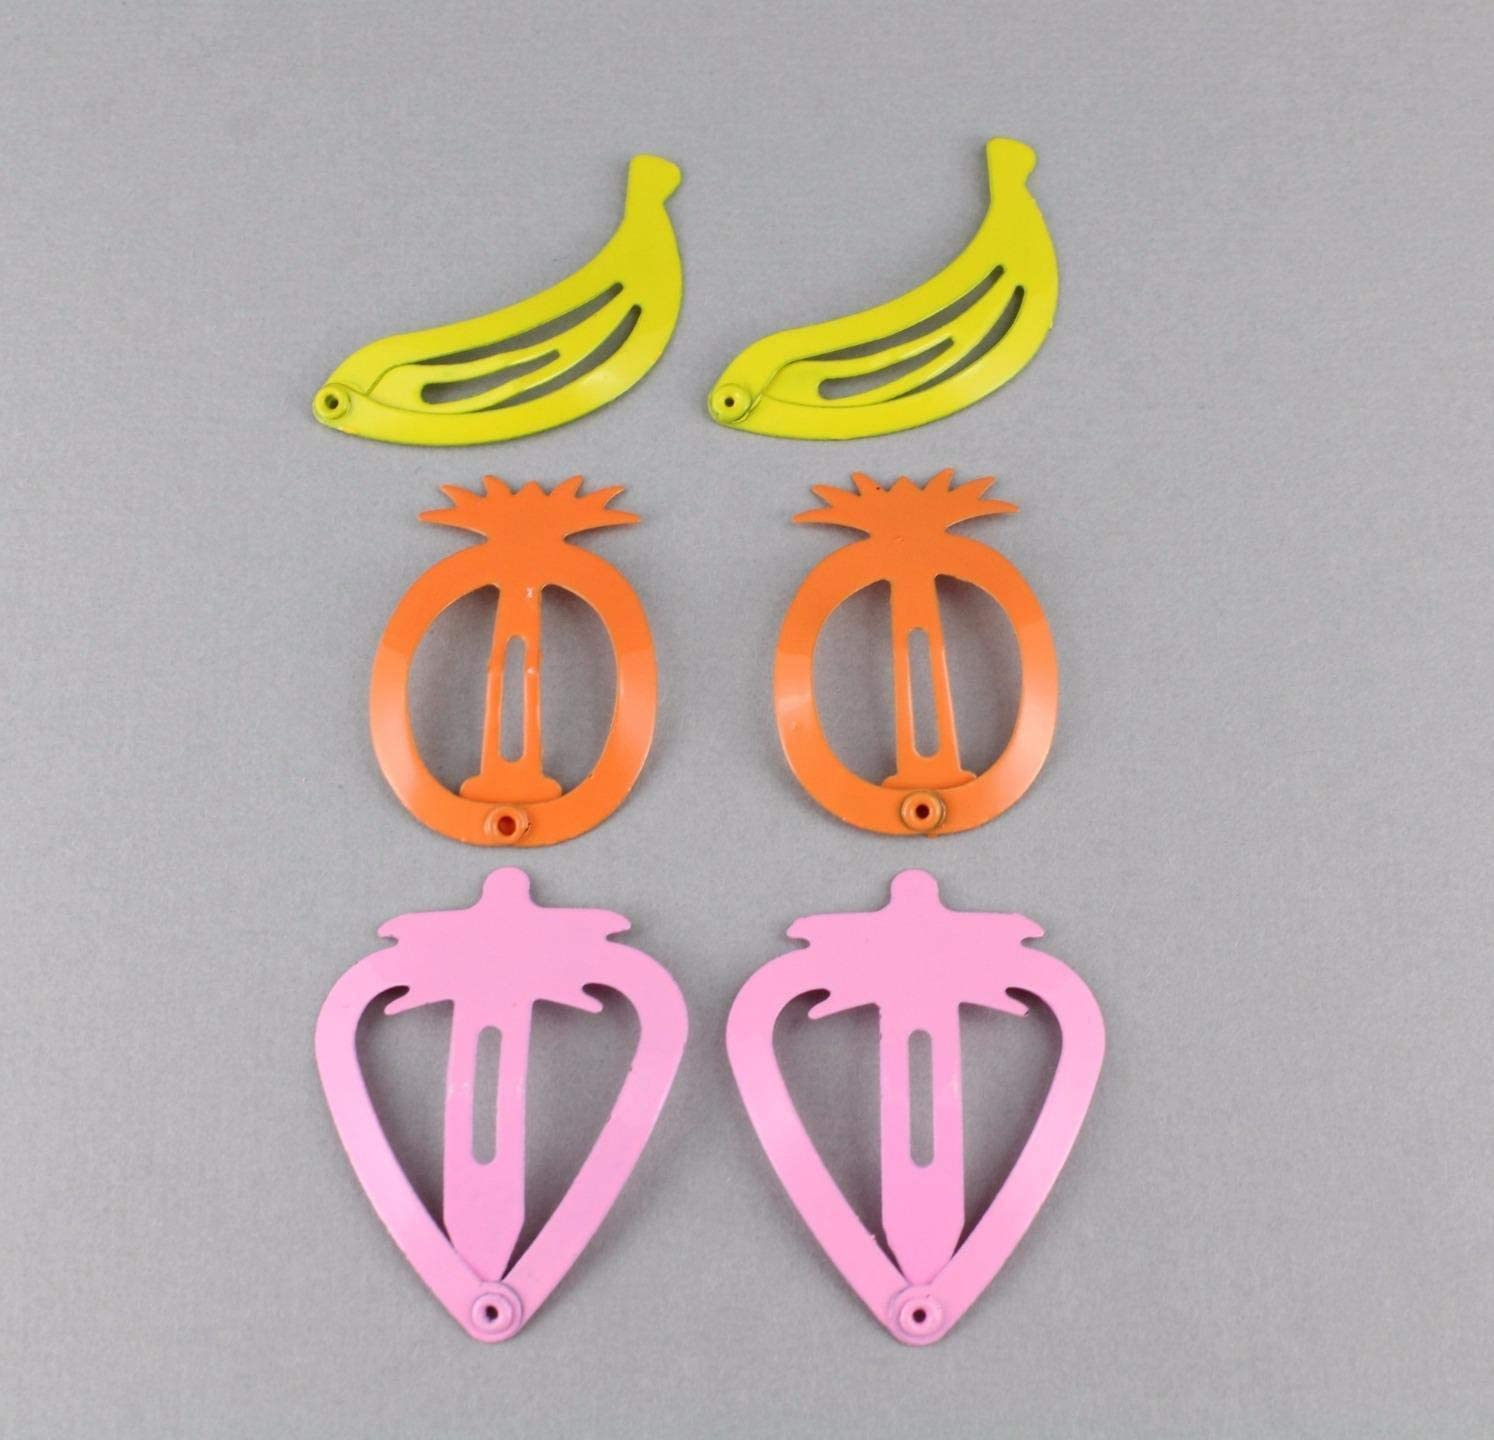 Details about  /Acrylic Metal Hair Clip Pineapple Women Bobby Pin Barrette Girl Headwear Fashion